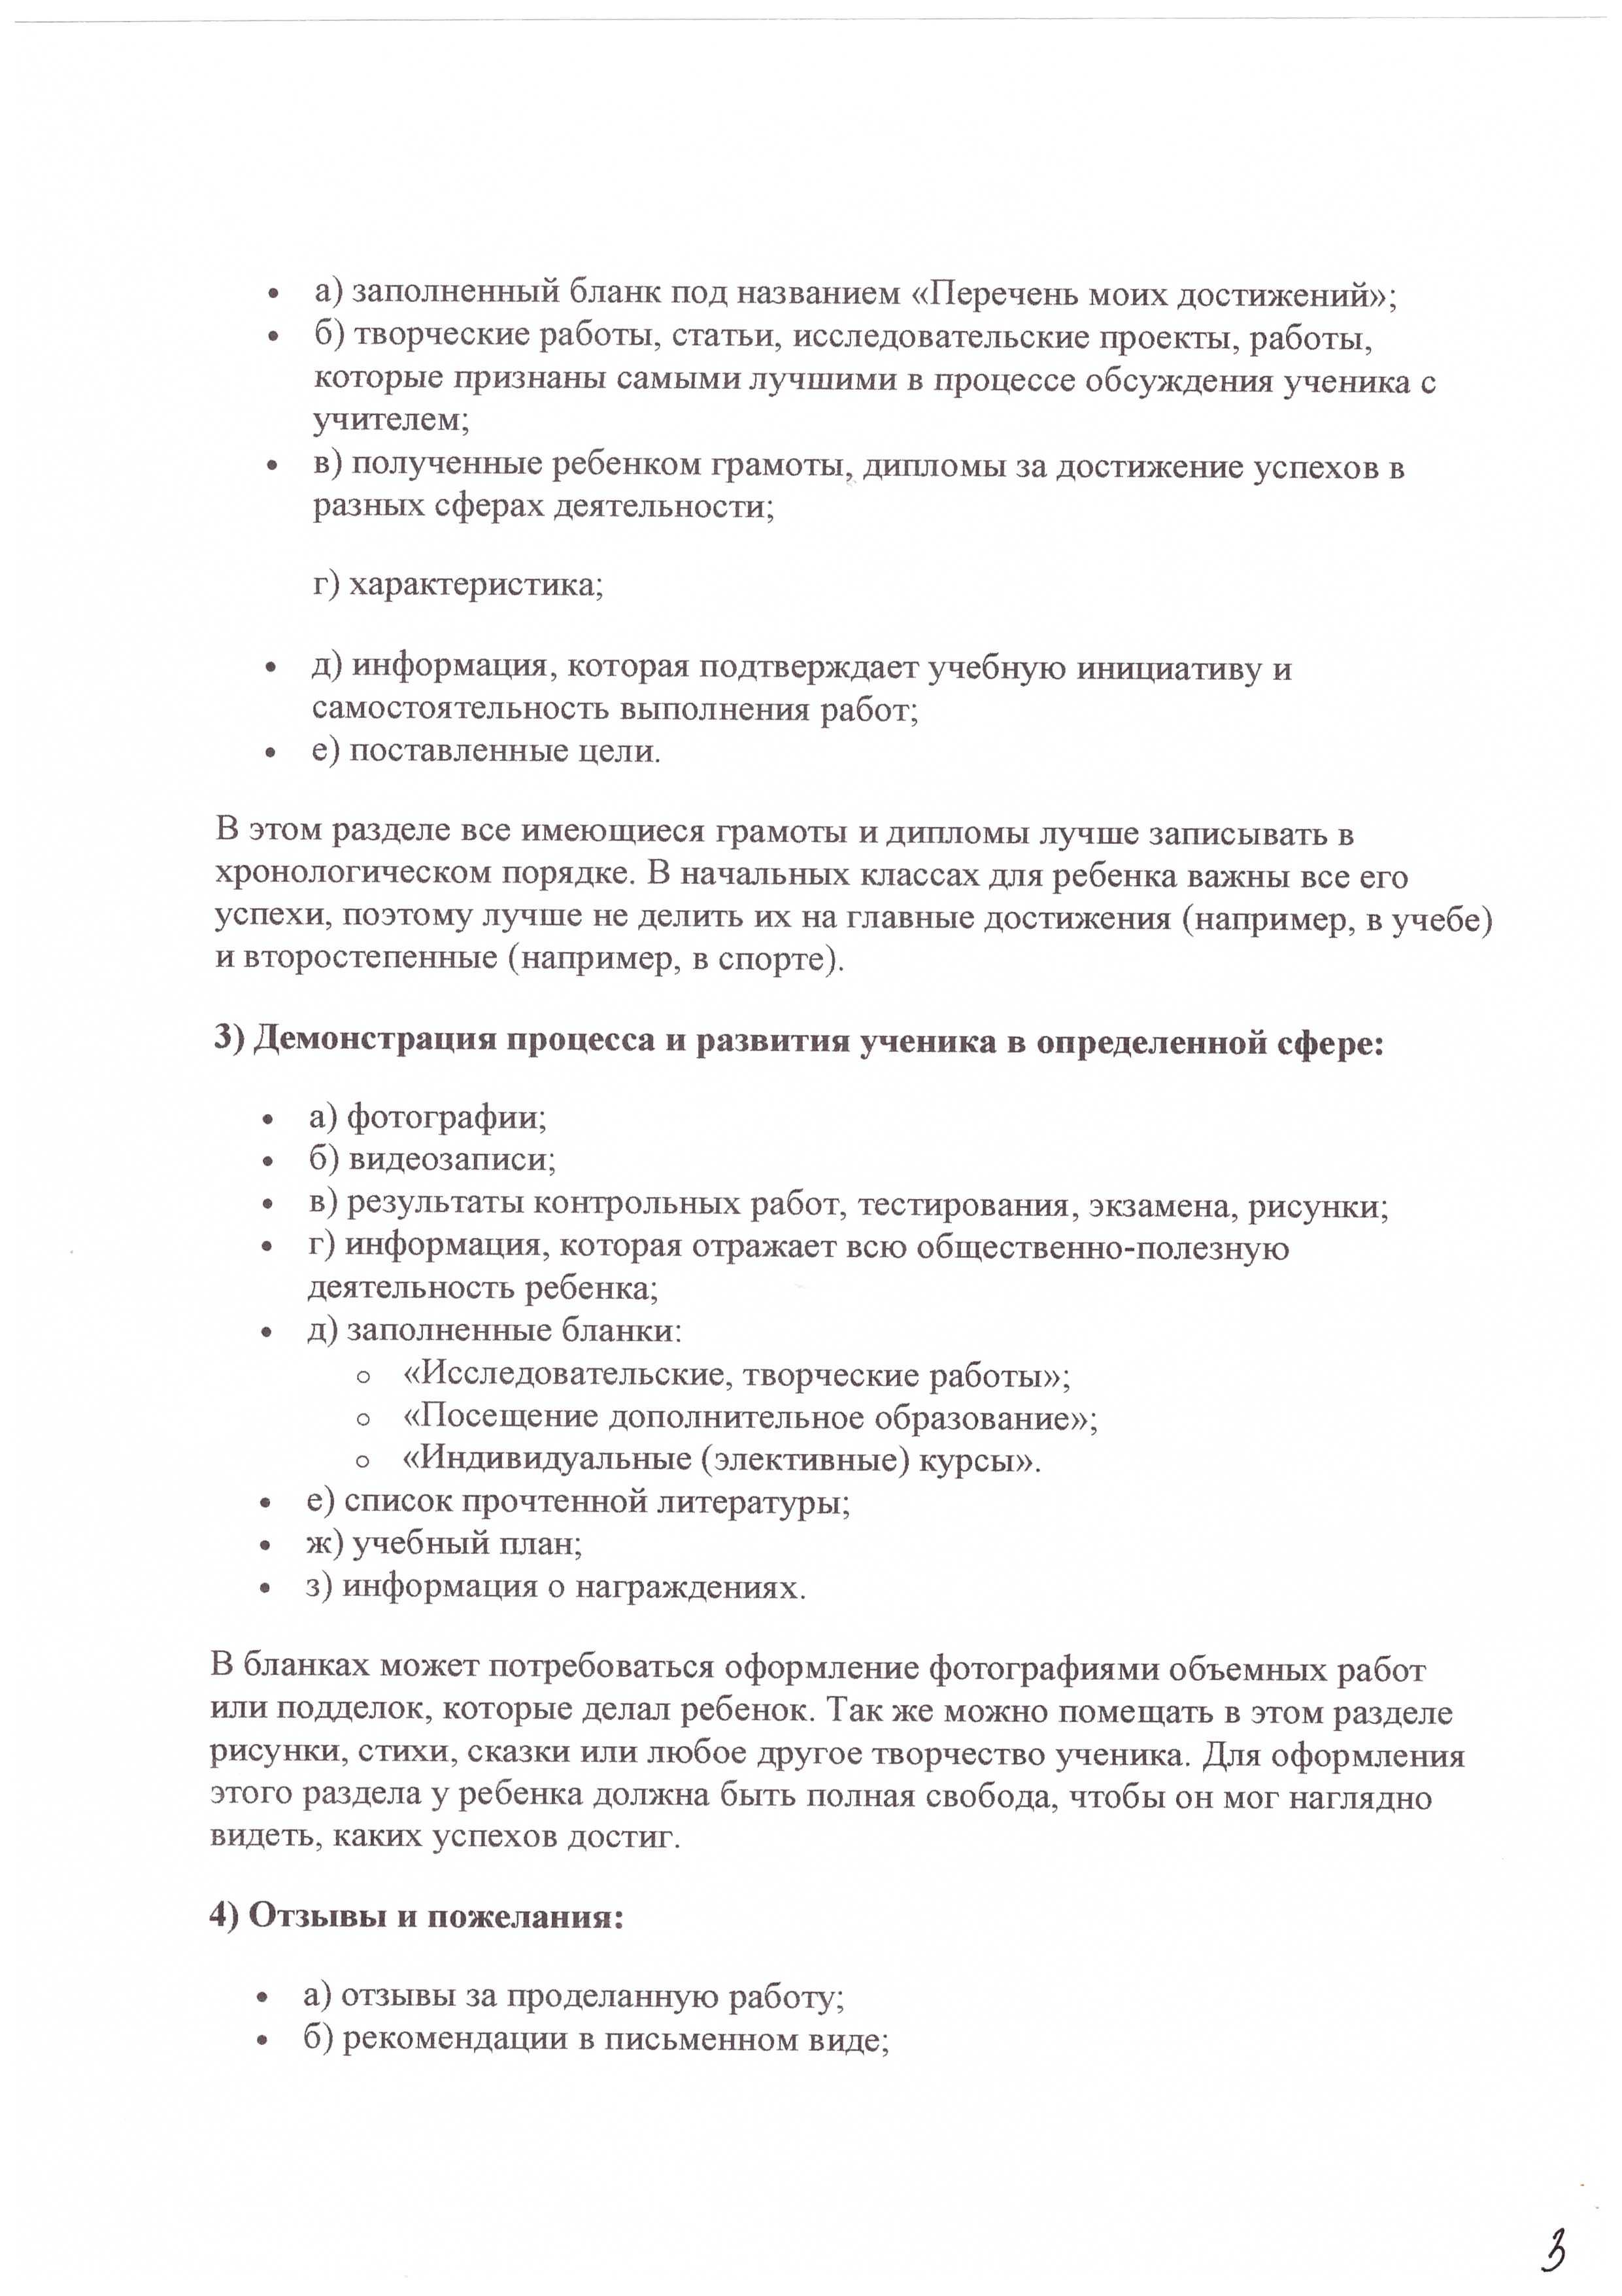 C:\Documents and Settings\Админ\Мои документы\стр.3..jpeg